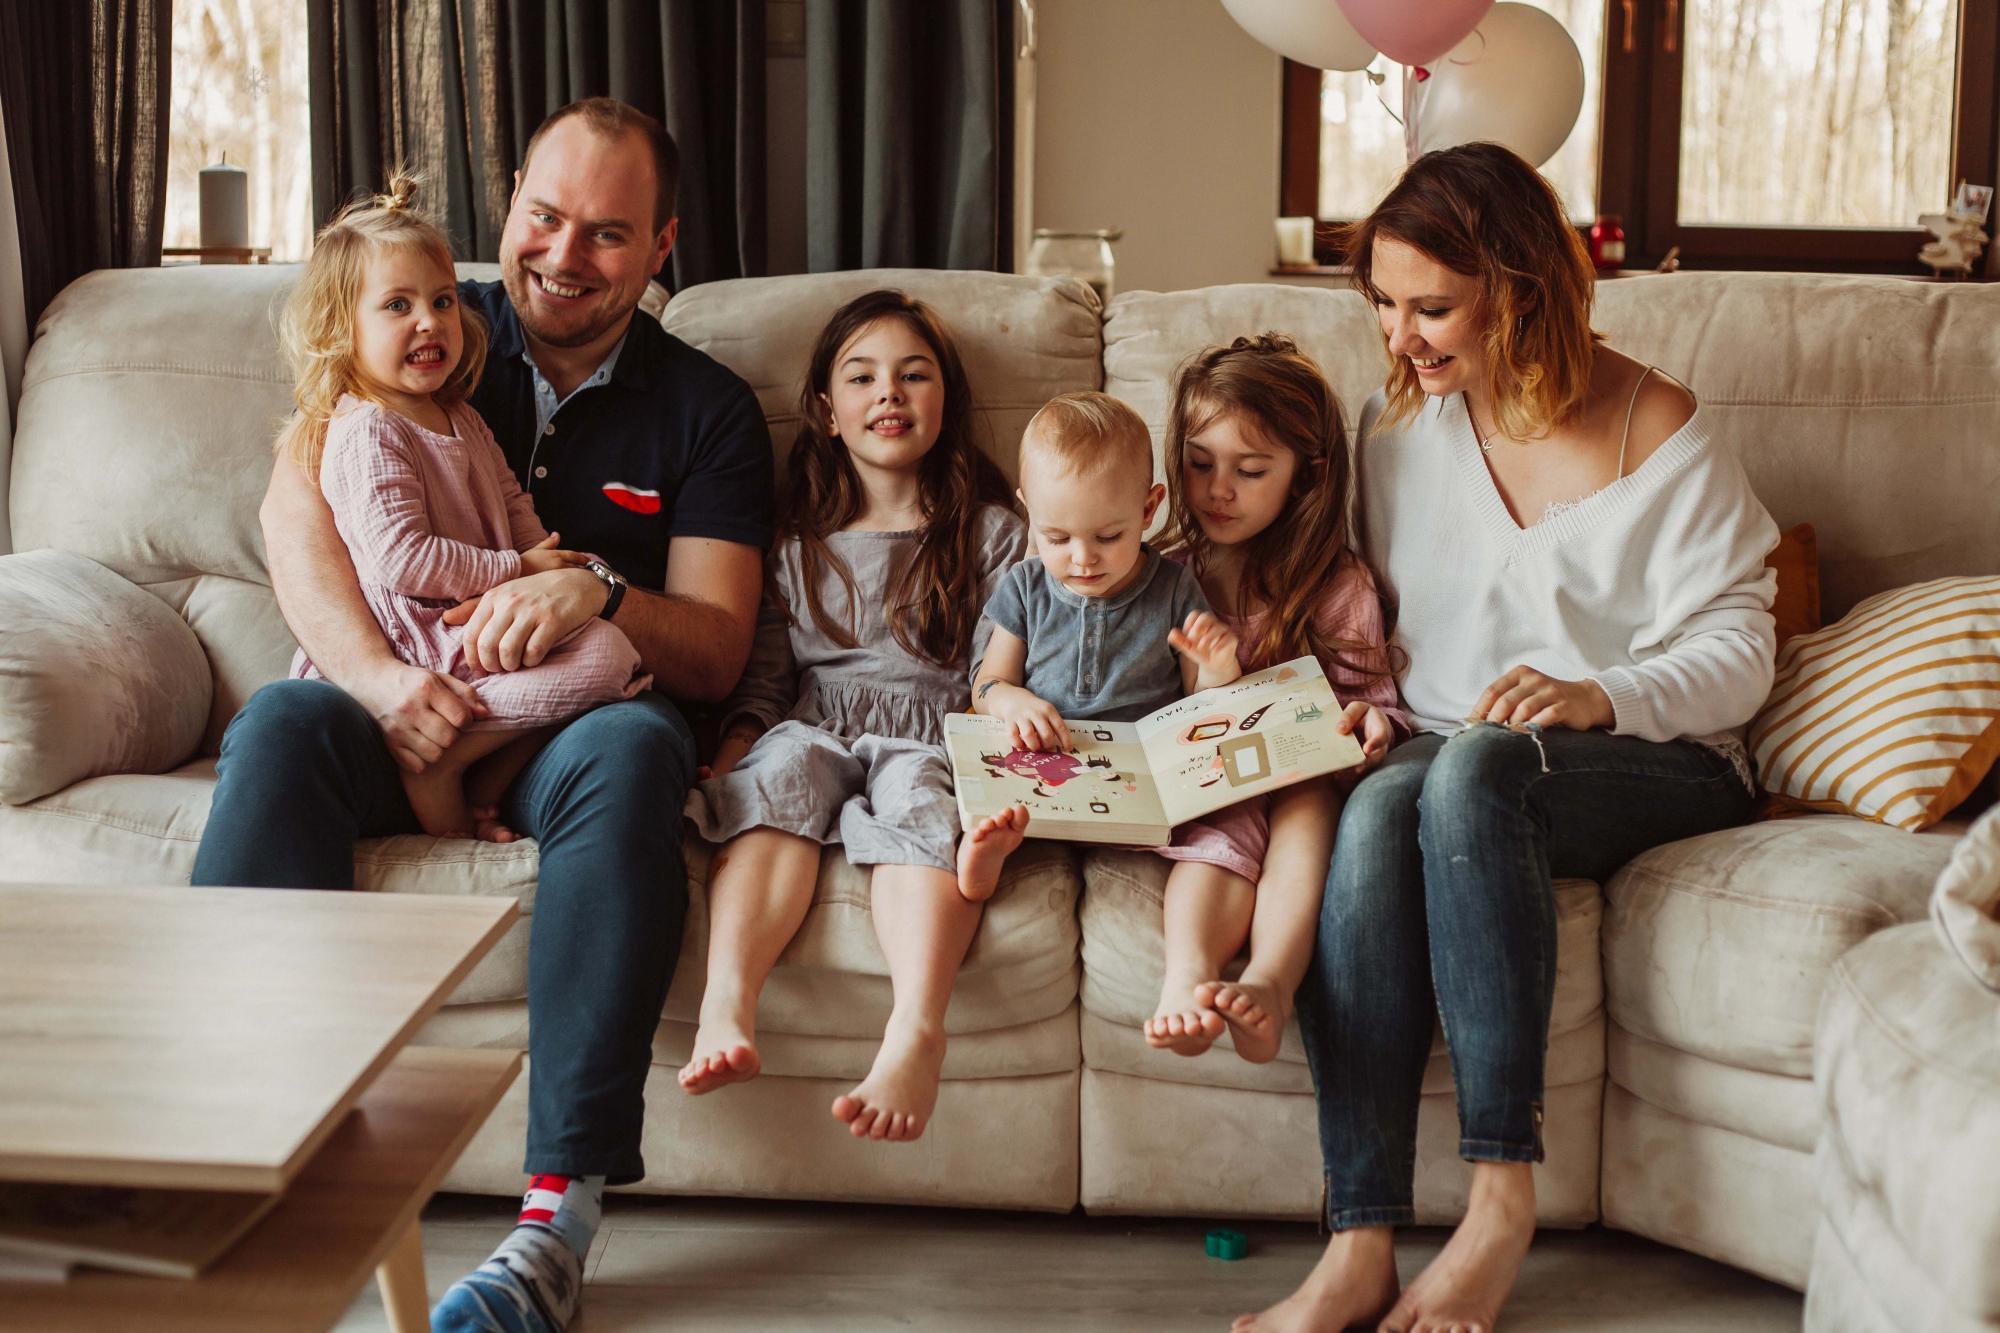 Sesja lifestyle rodzinna